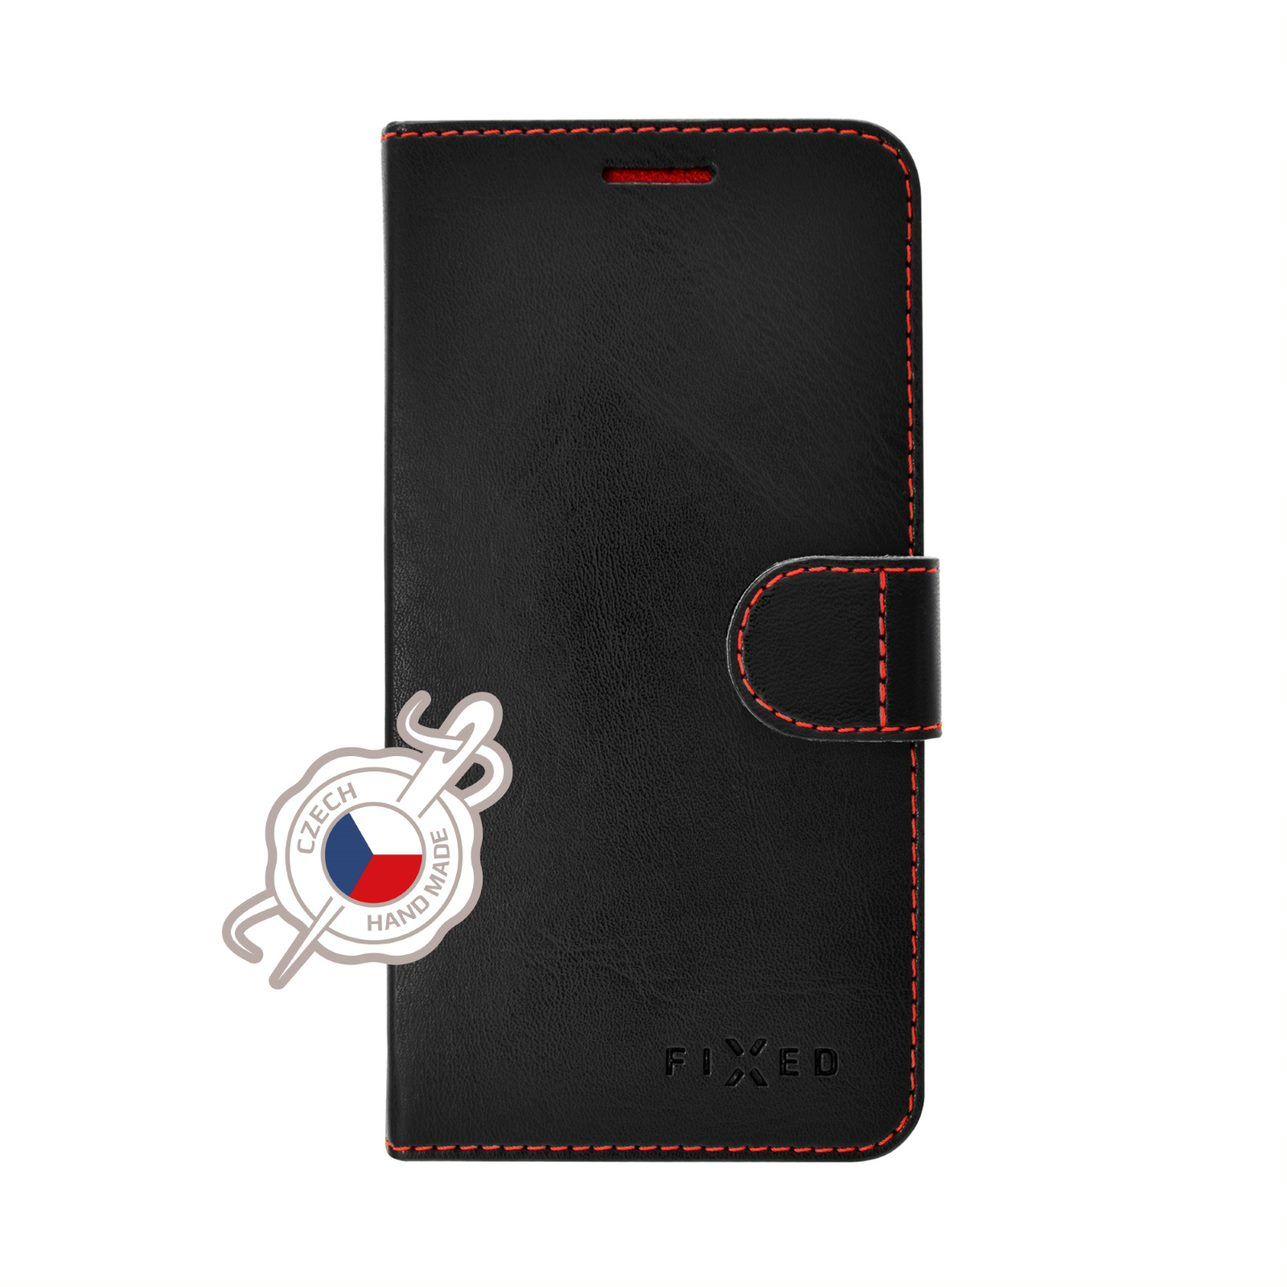 FIXED FIT flipové pouzdro, obal, kryt Samsung Galaxy A51 black